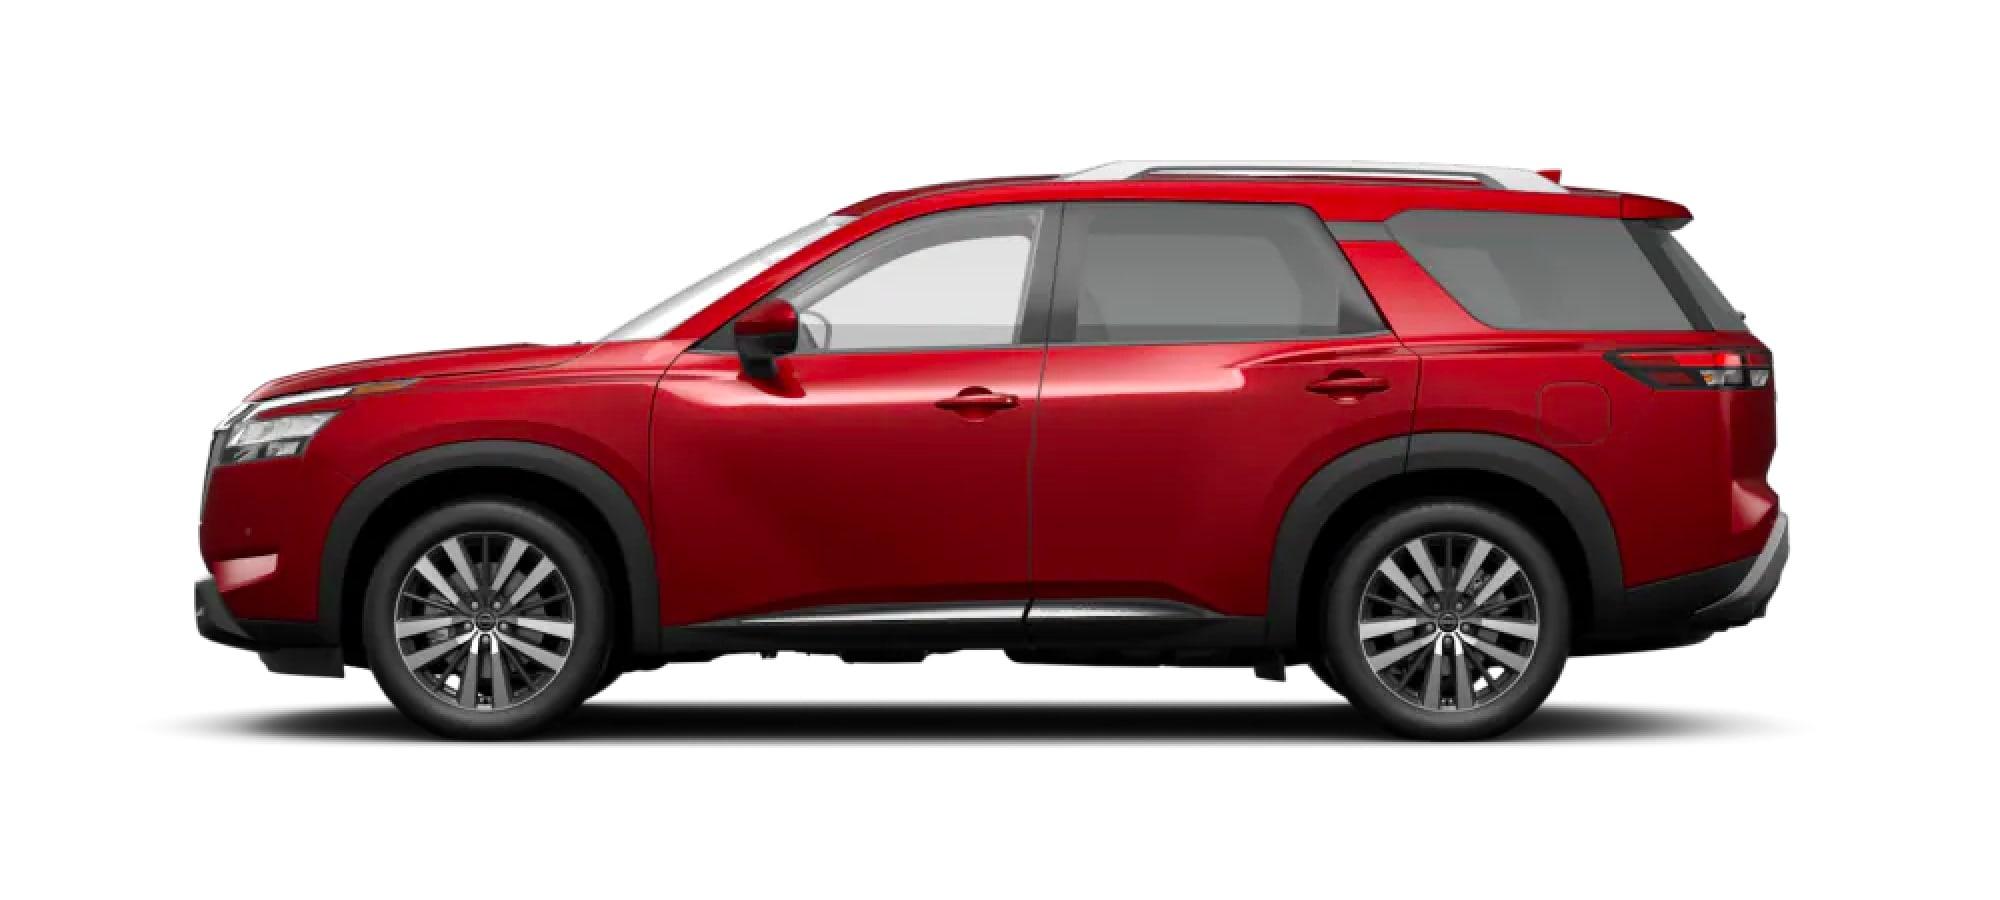 2022 Nissan Pathfinder in Scarlet Ember Tintcoat